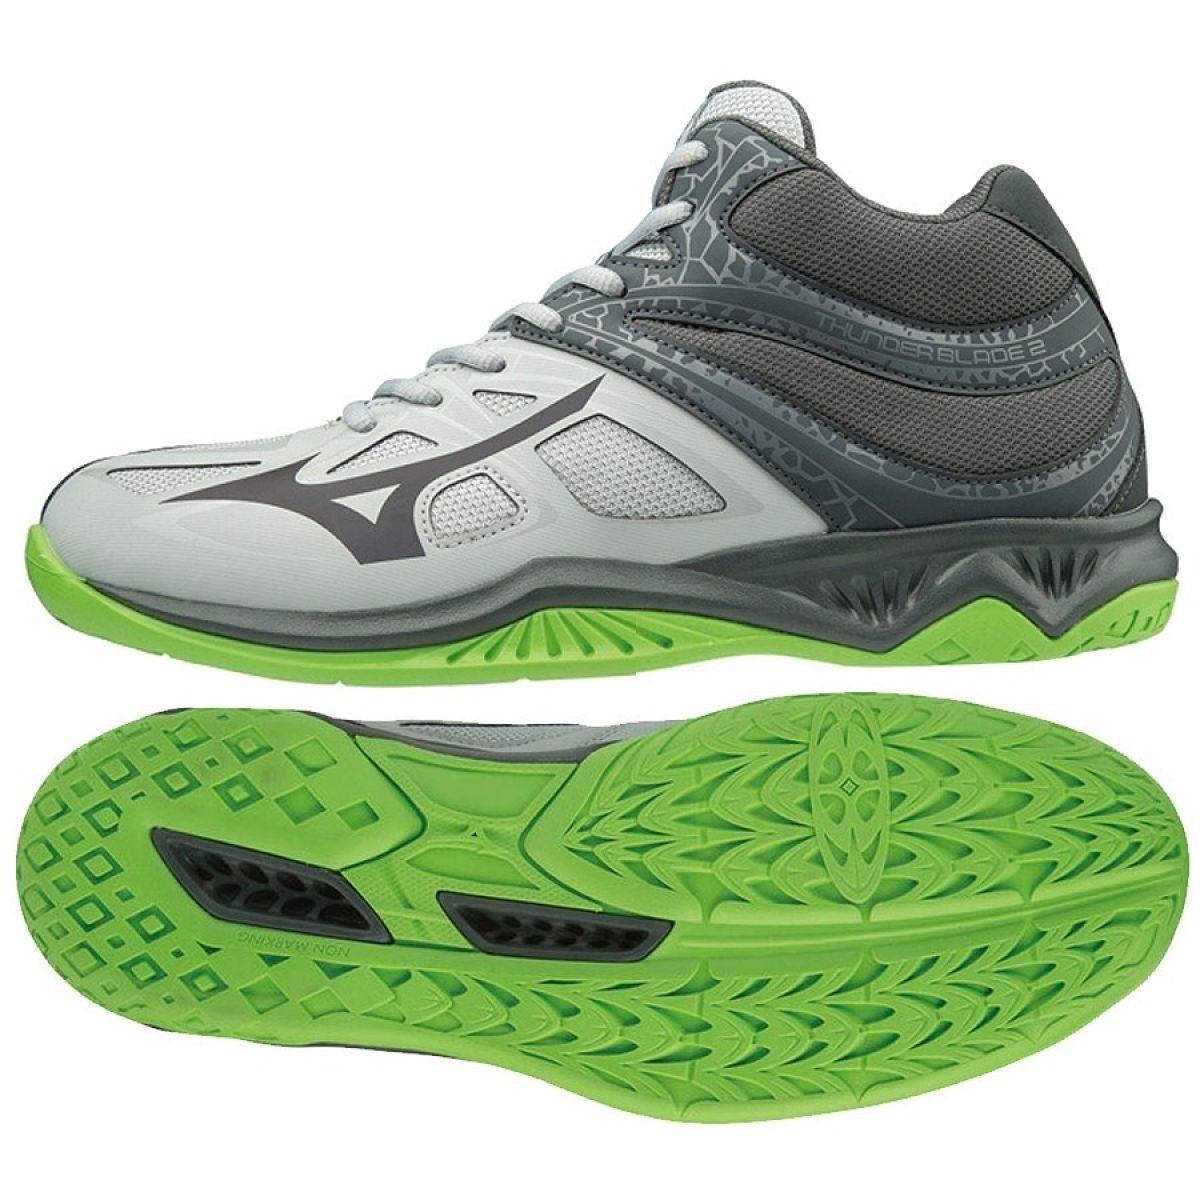 Mizuno Thunder Blade 2 Mid M V1ga197537 Shoes Grey Gray Silver With Images Mizuno Shoes Mizuno Shoes